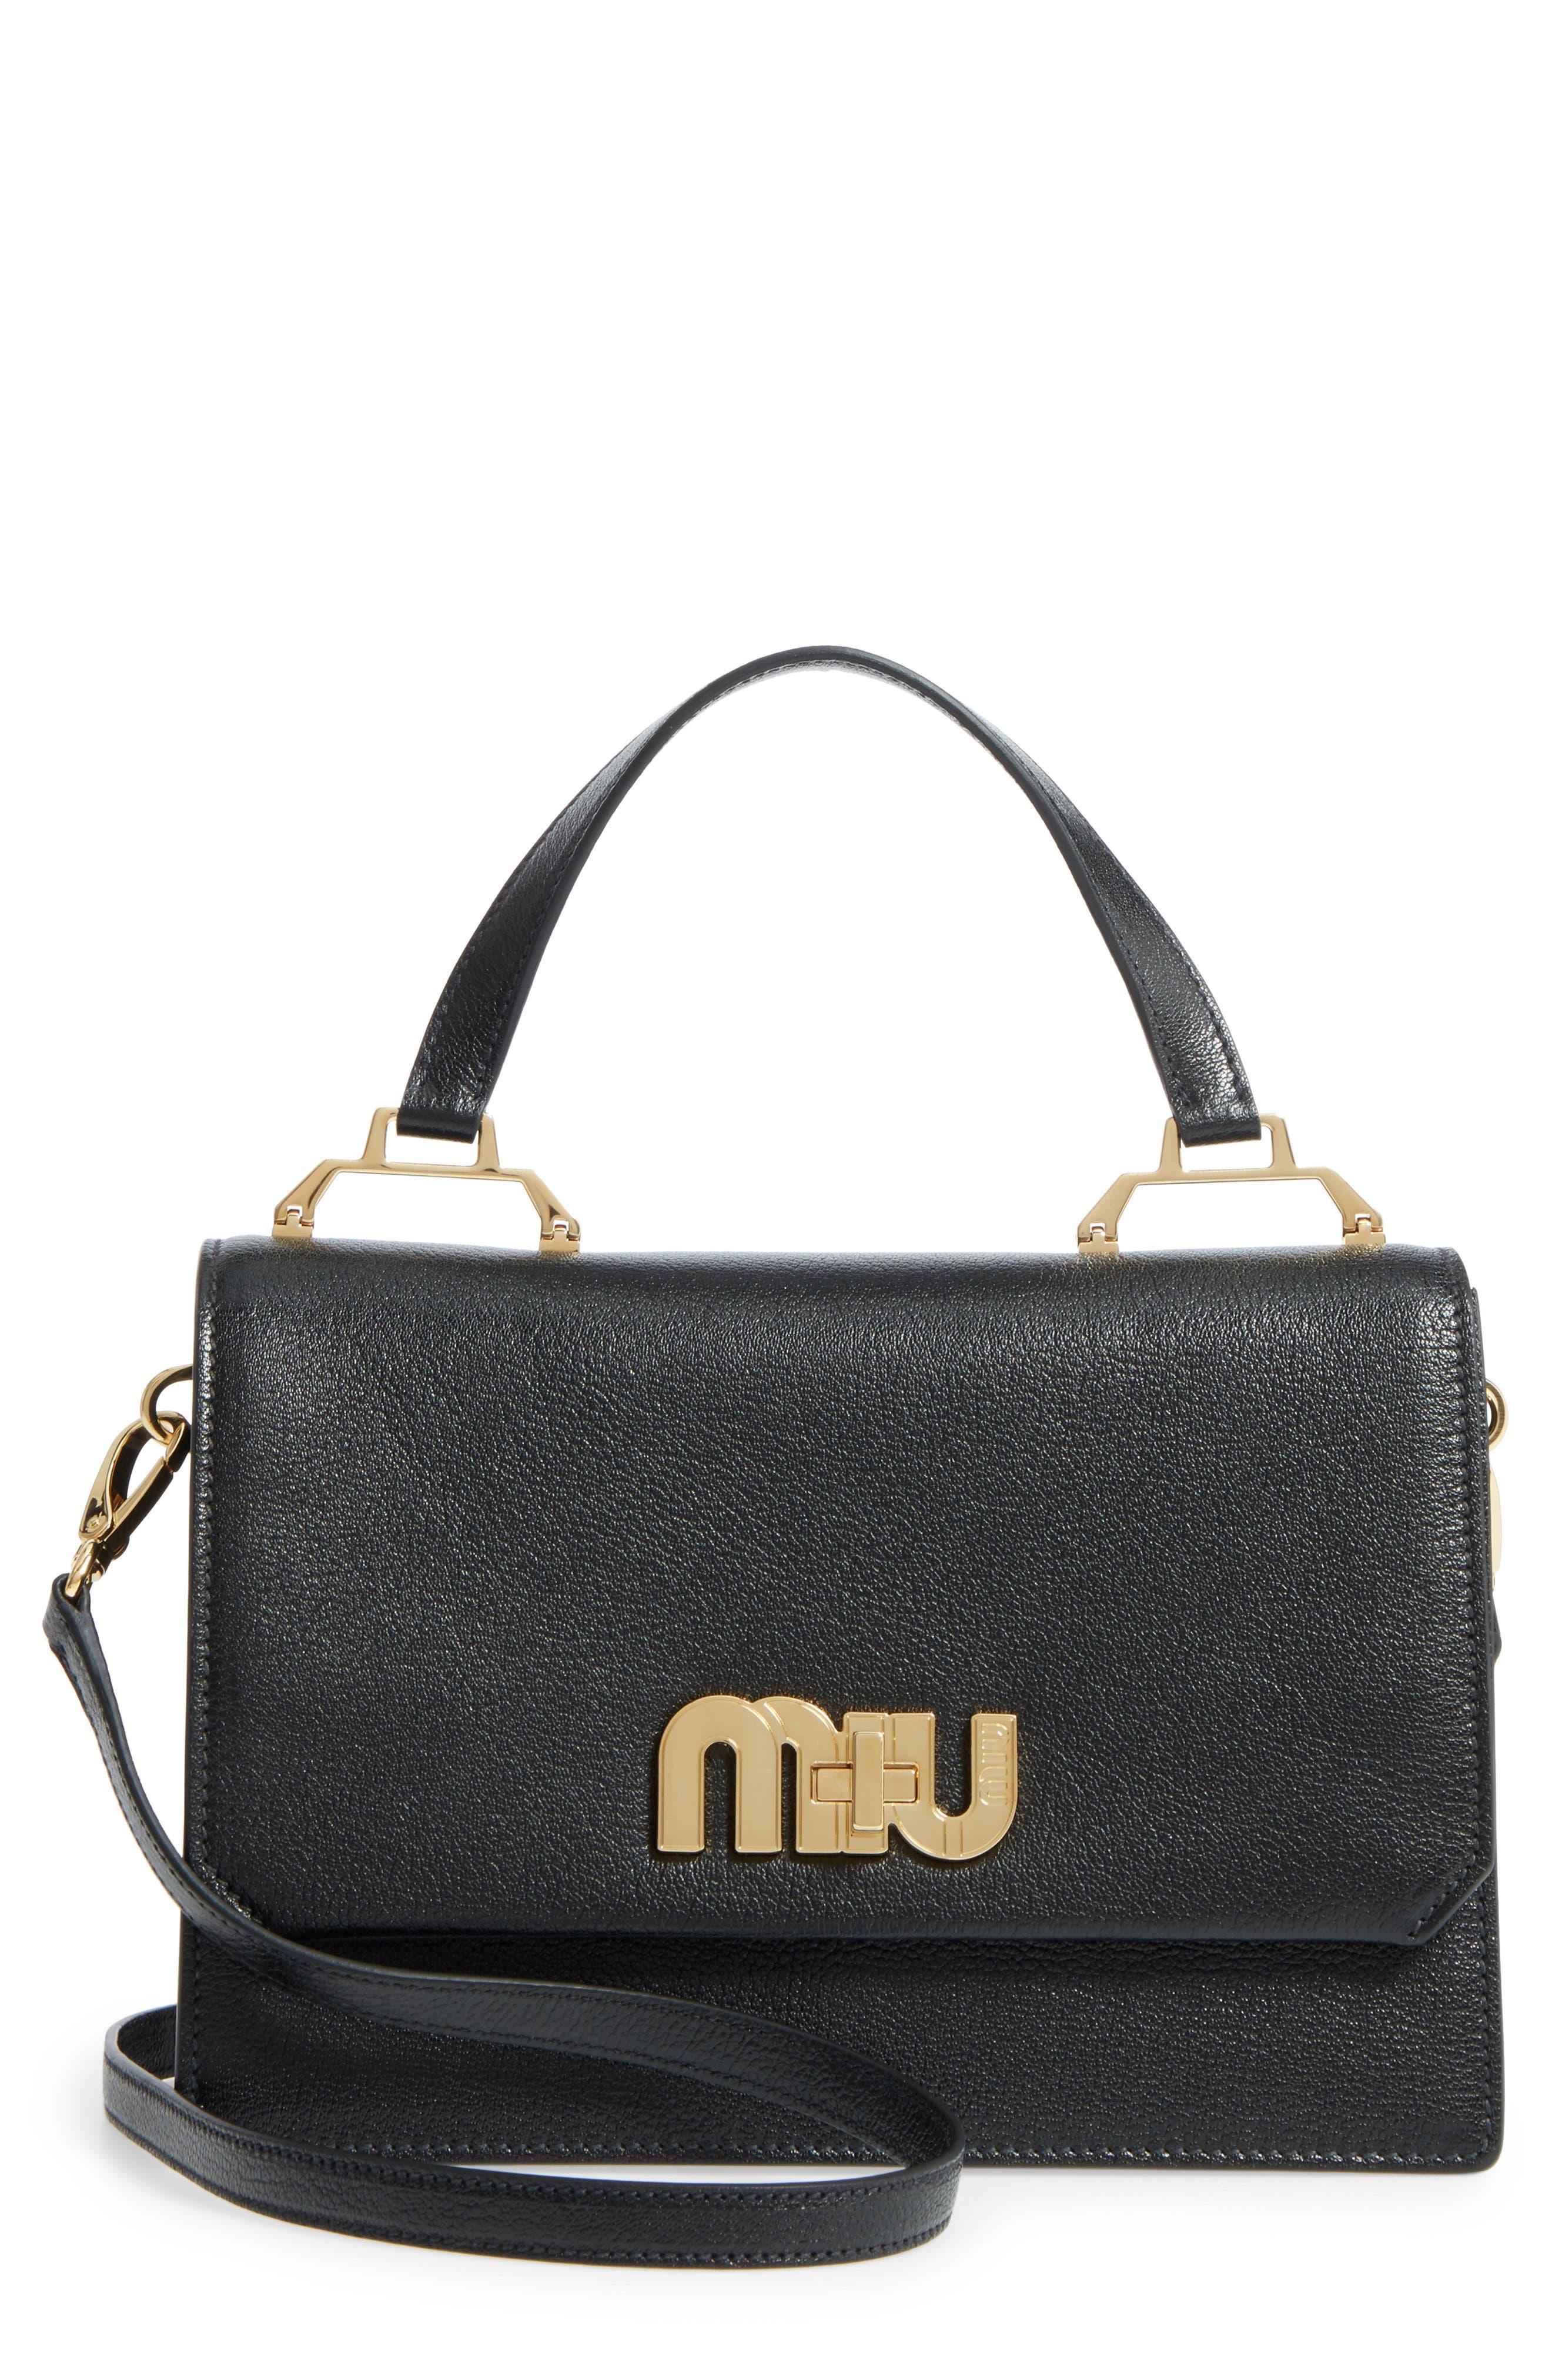 Medium Madras Logo Hardware Leather Satchel,                             Main thumbnail 1, color,                             Nero